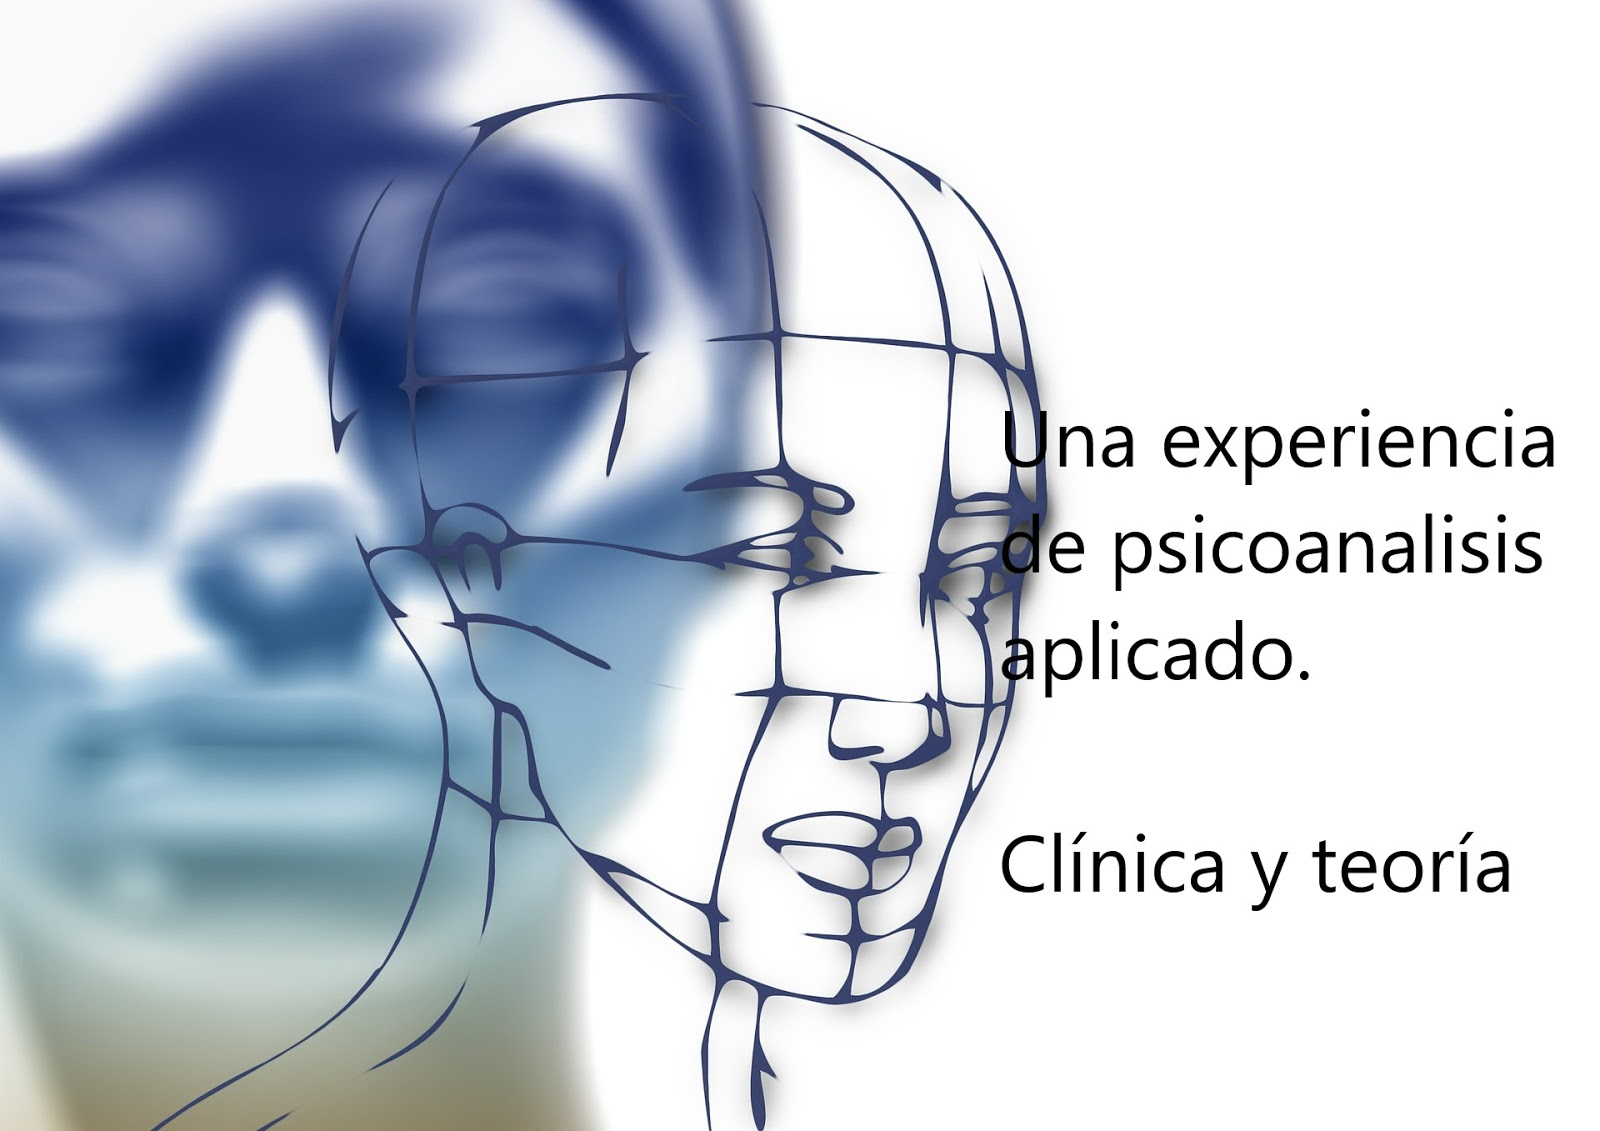 Psicoterapia breve psicoanalítica. Libro para descargar.